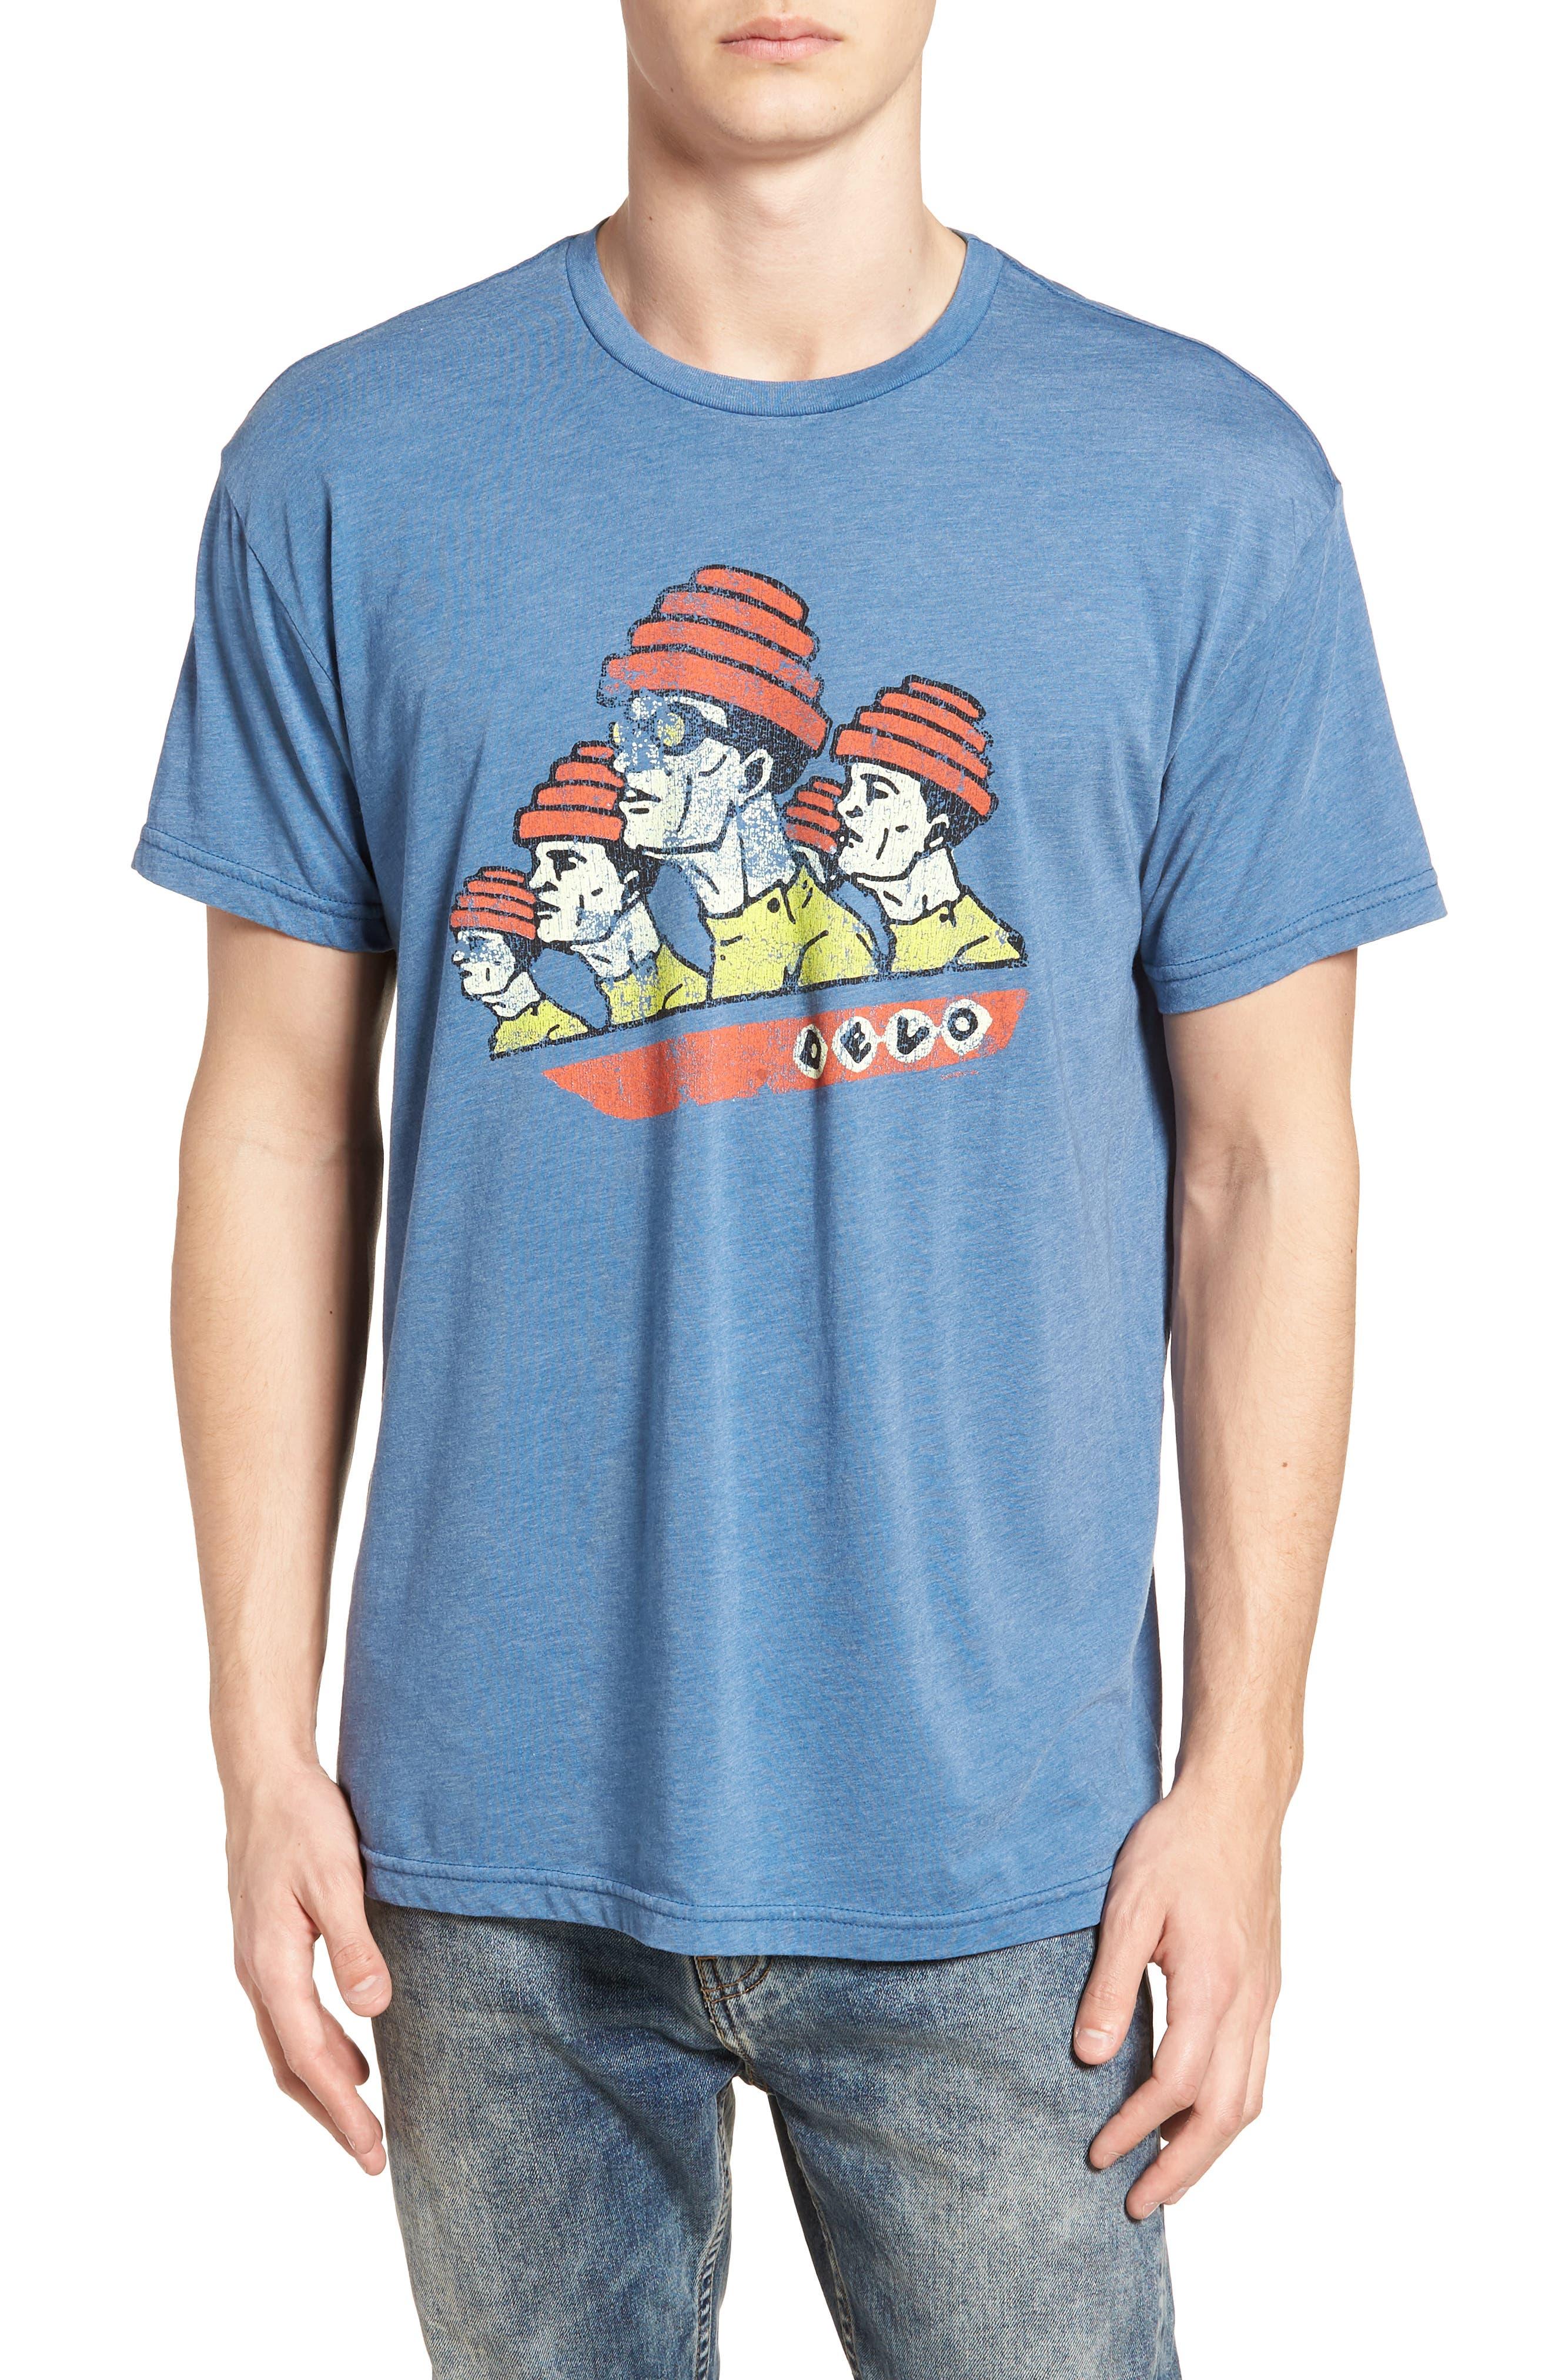 Devo Graphic T-Shirt,                             Main thumbnail 1, color,                             400